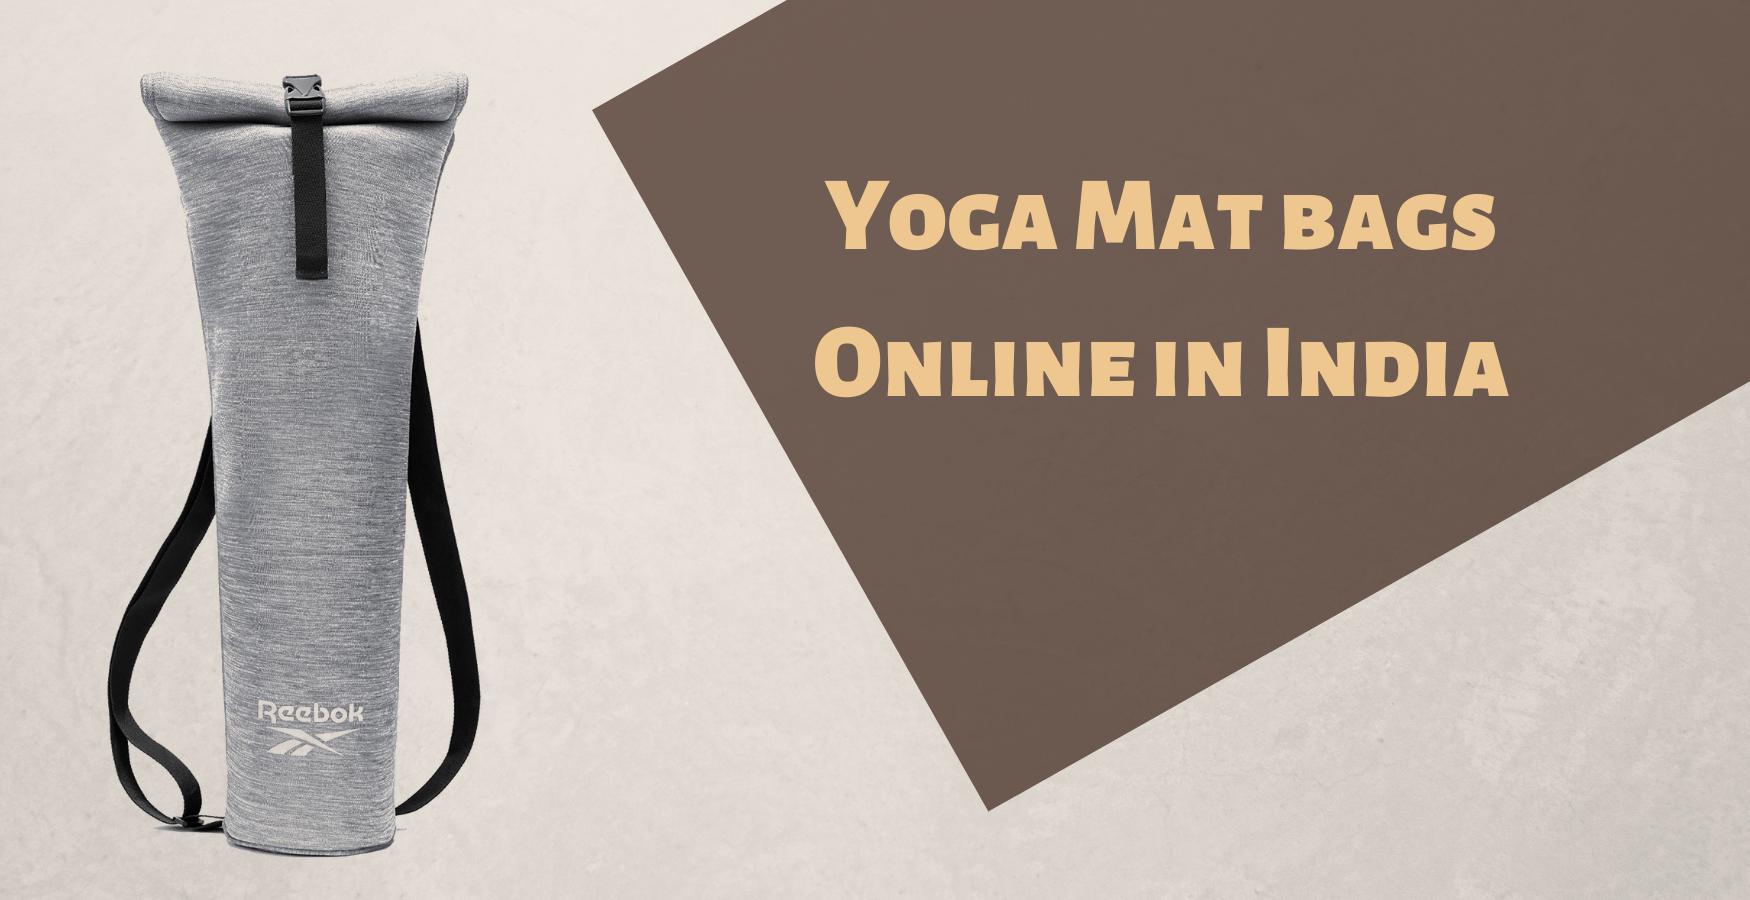 Best Yoga Mat Bags Online